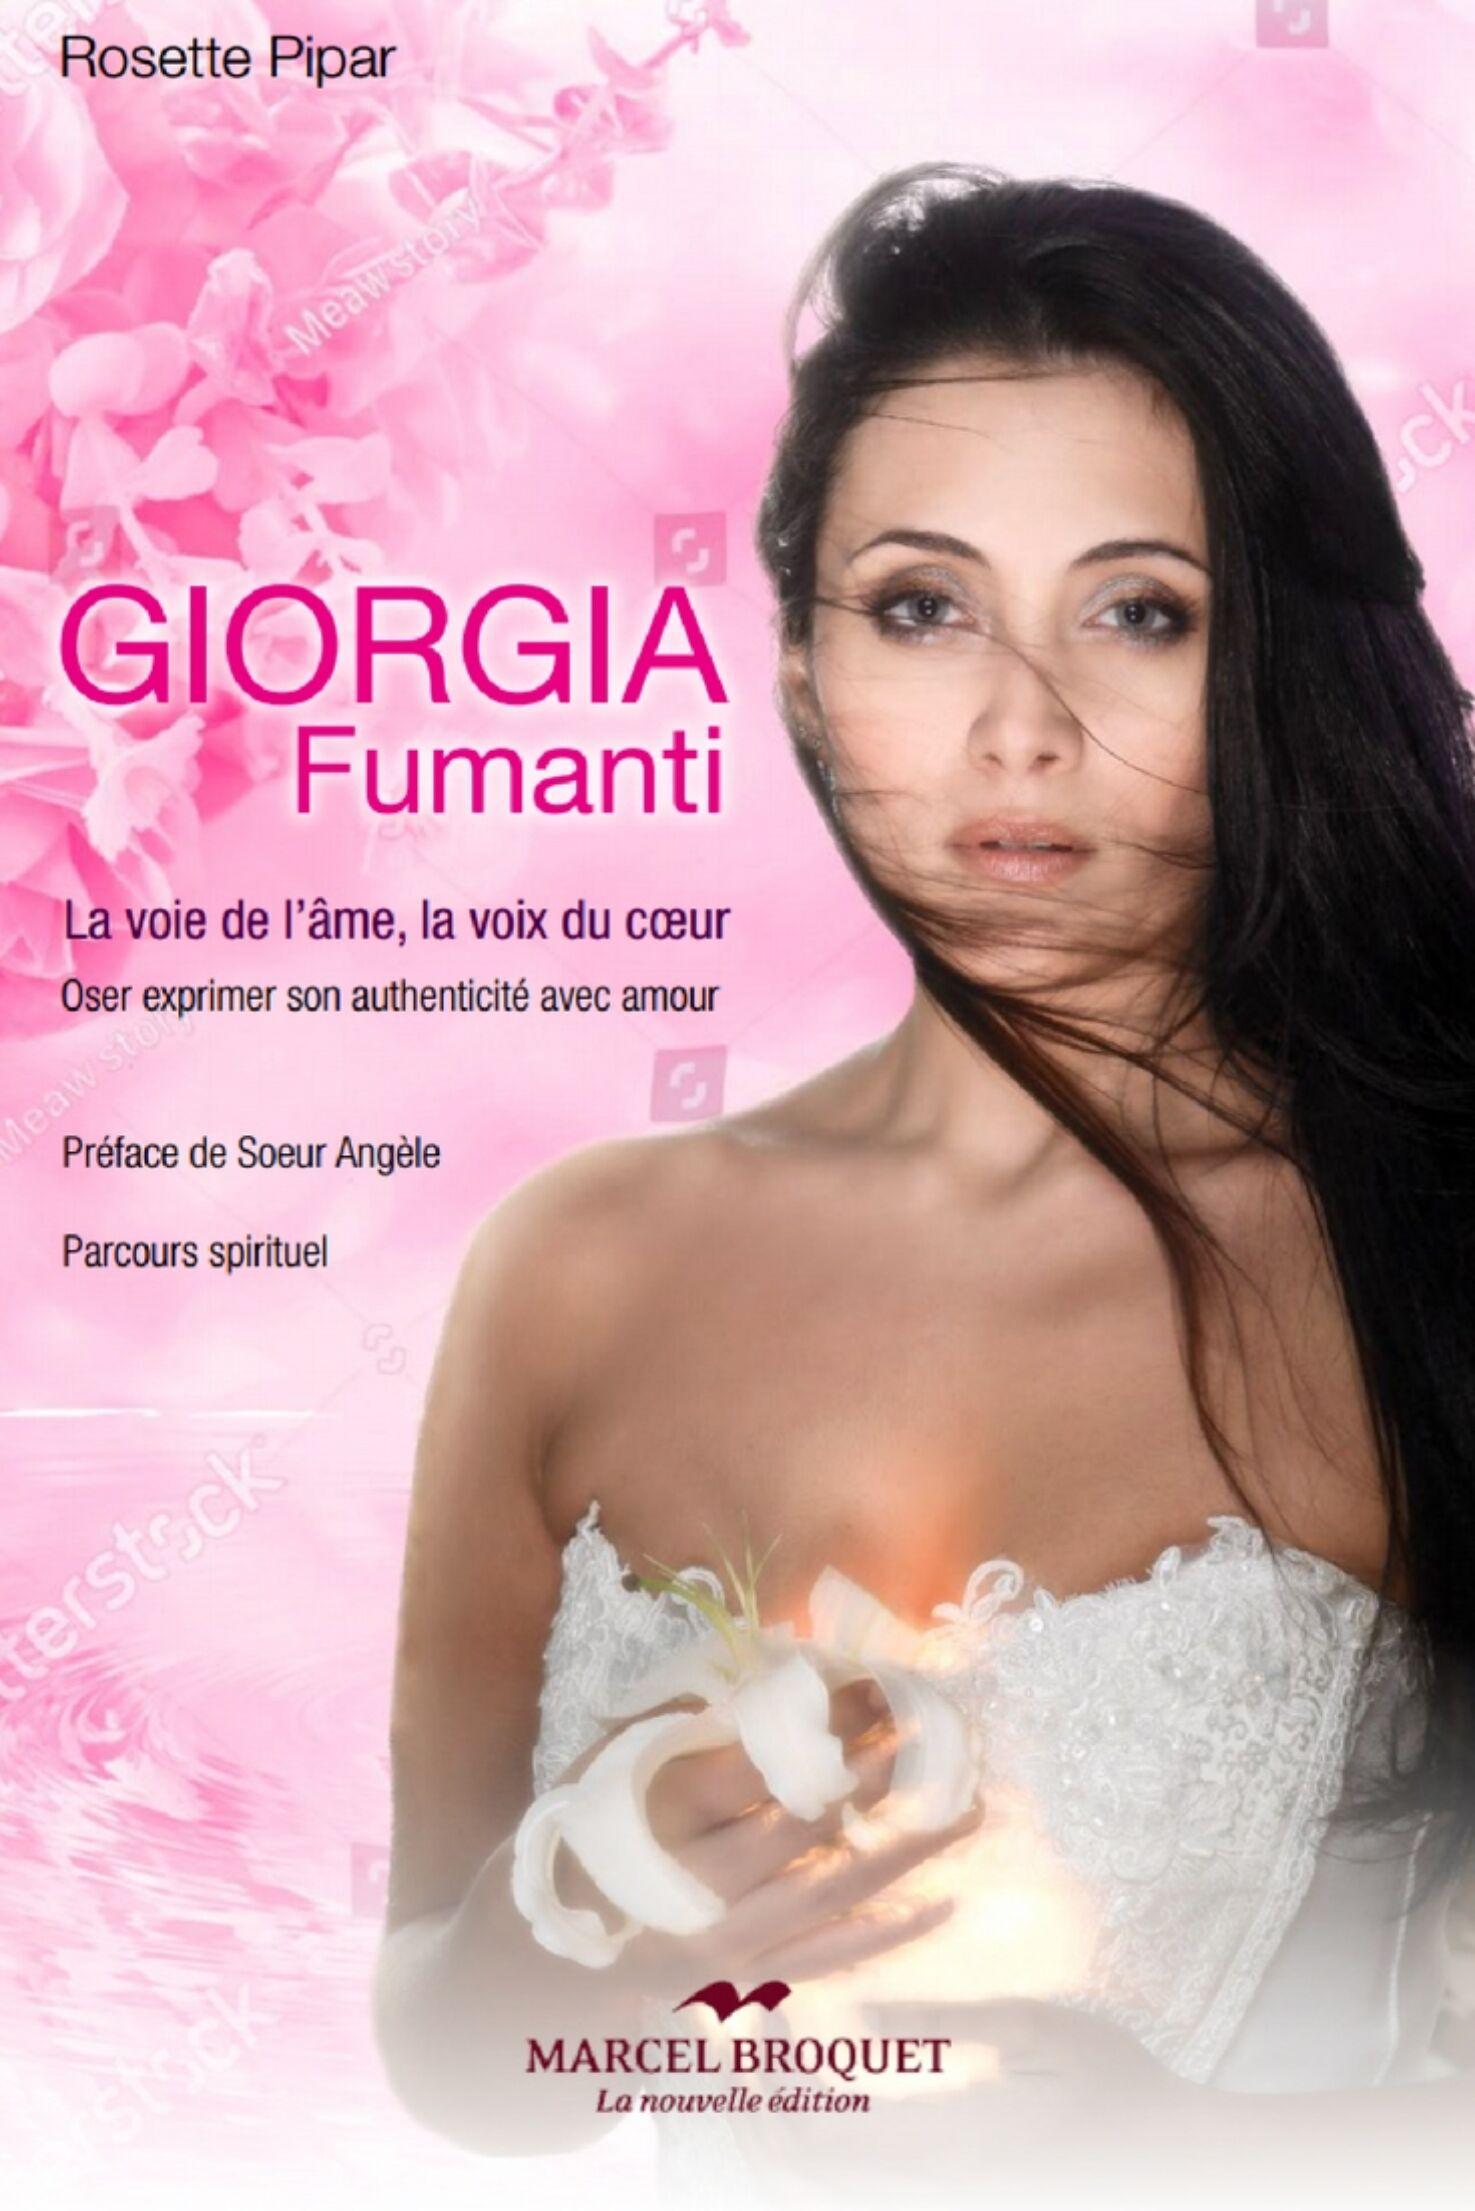 Rosette Pipar/Giorgia Fumanti